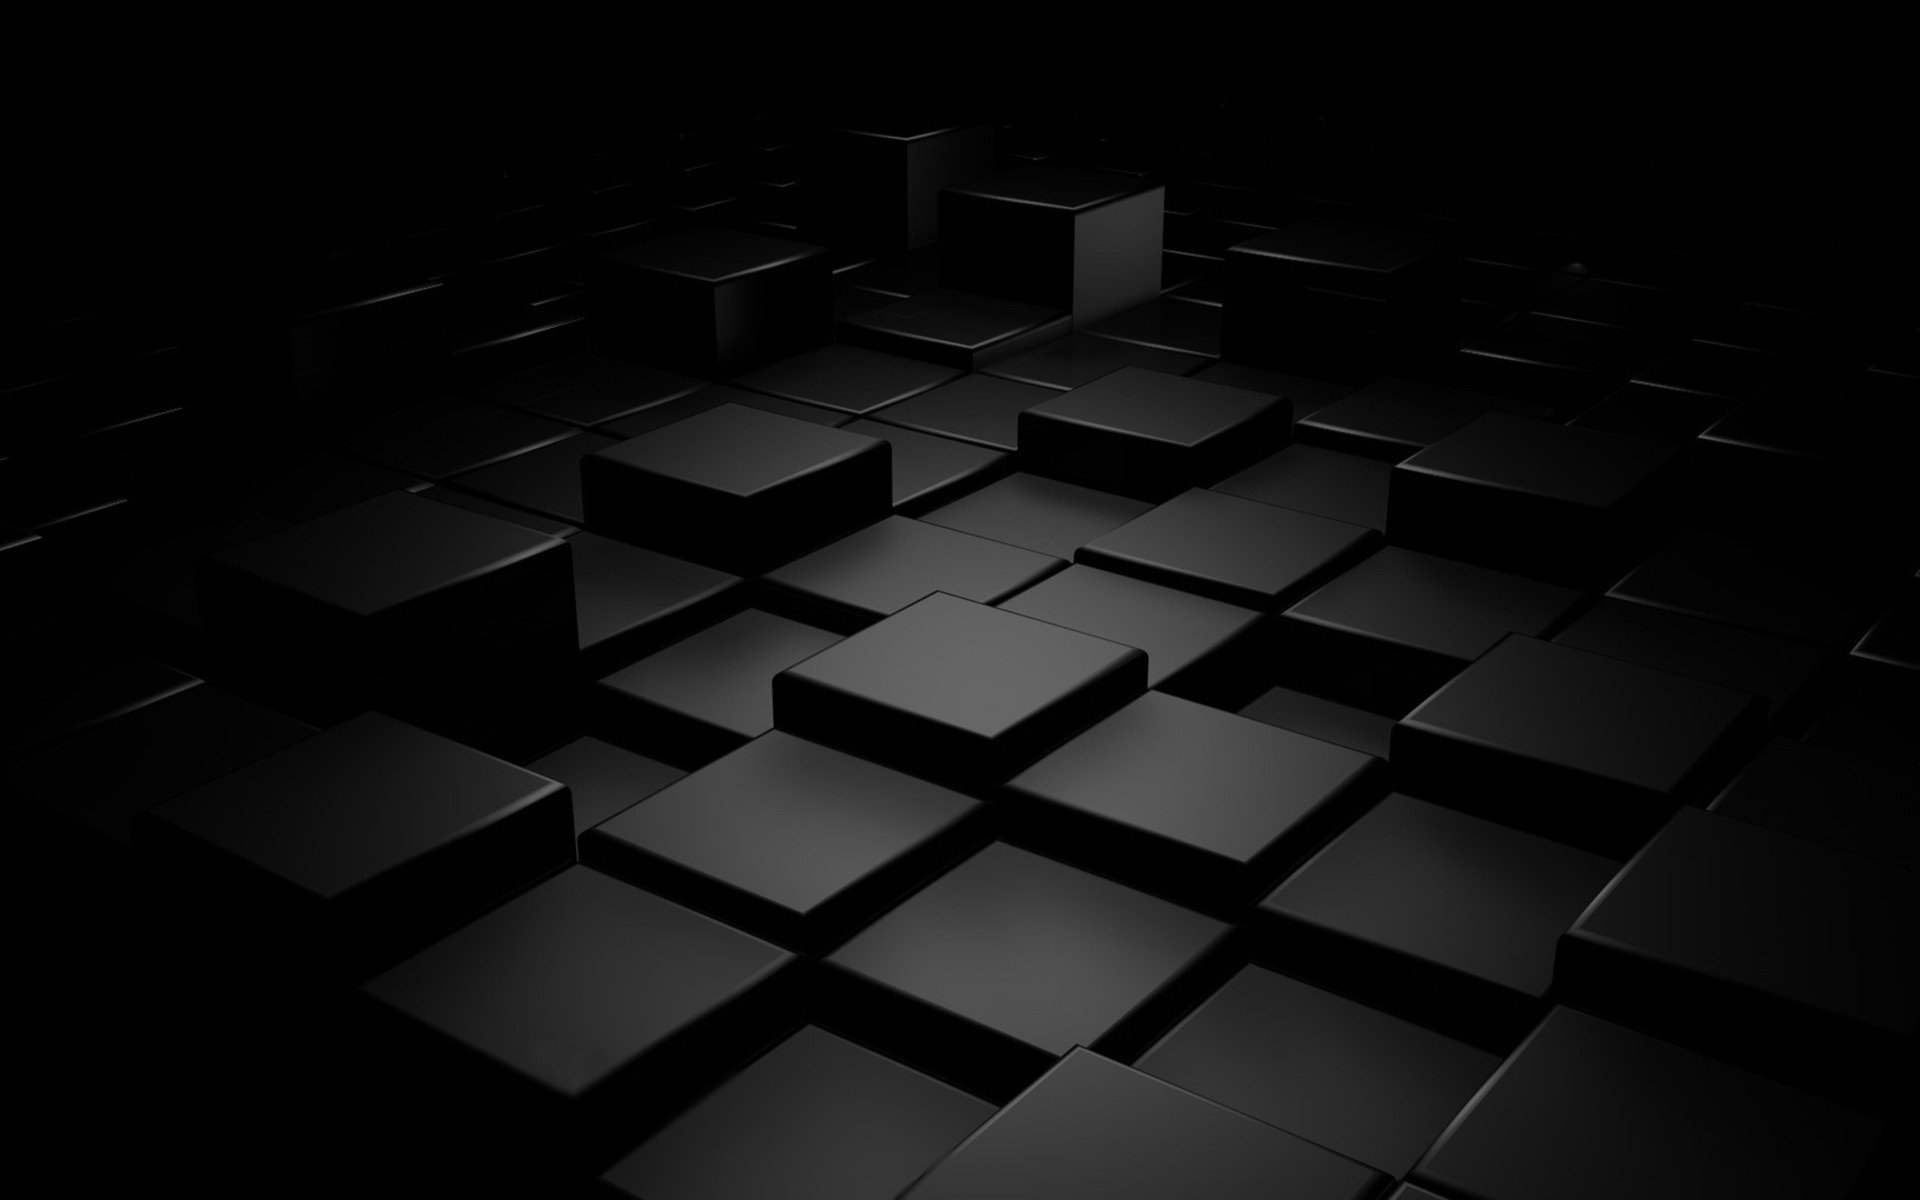 Plain Black 3d 12 Desktop Wallpaper ...